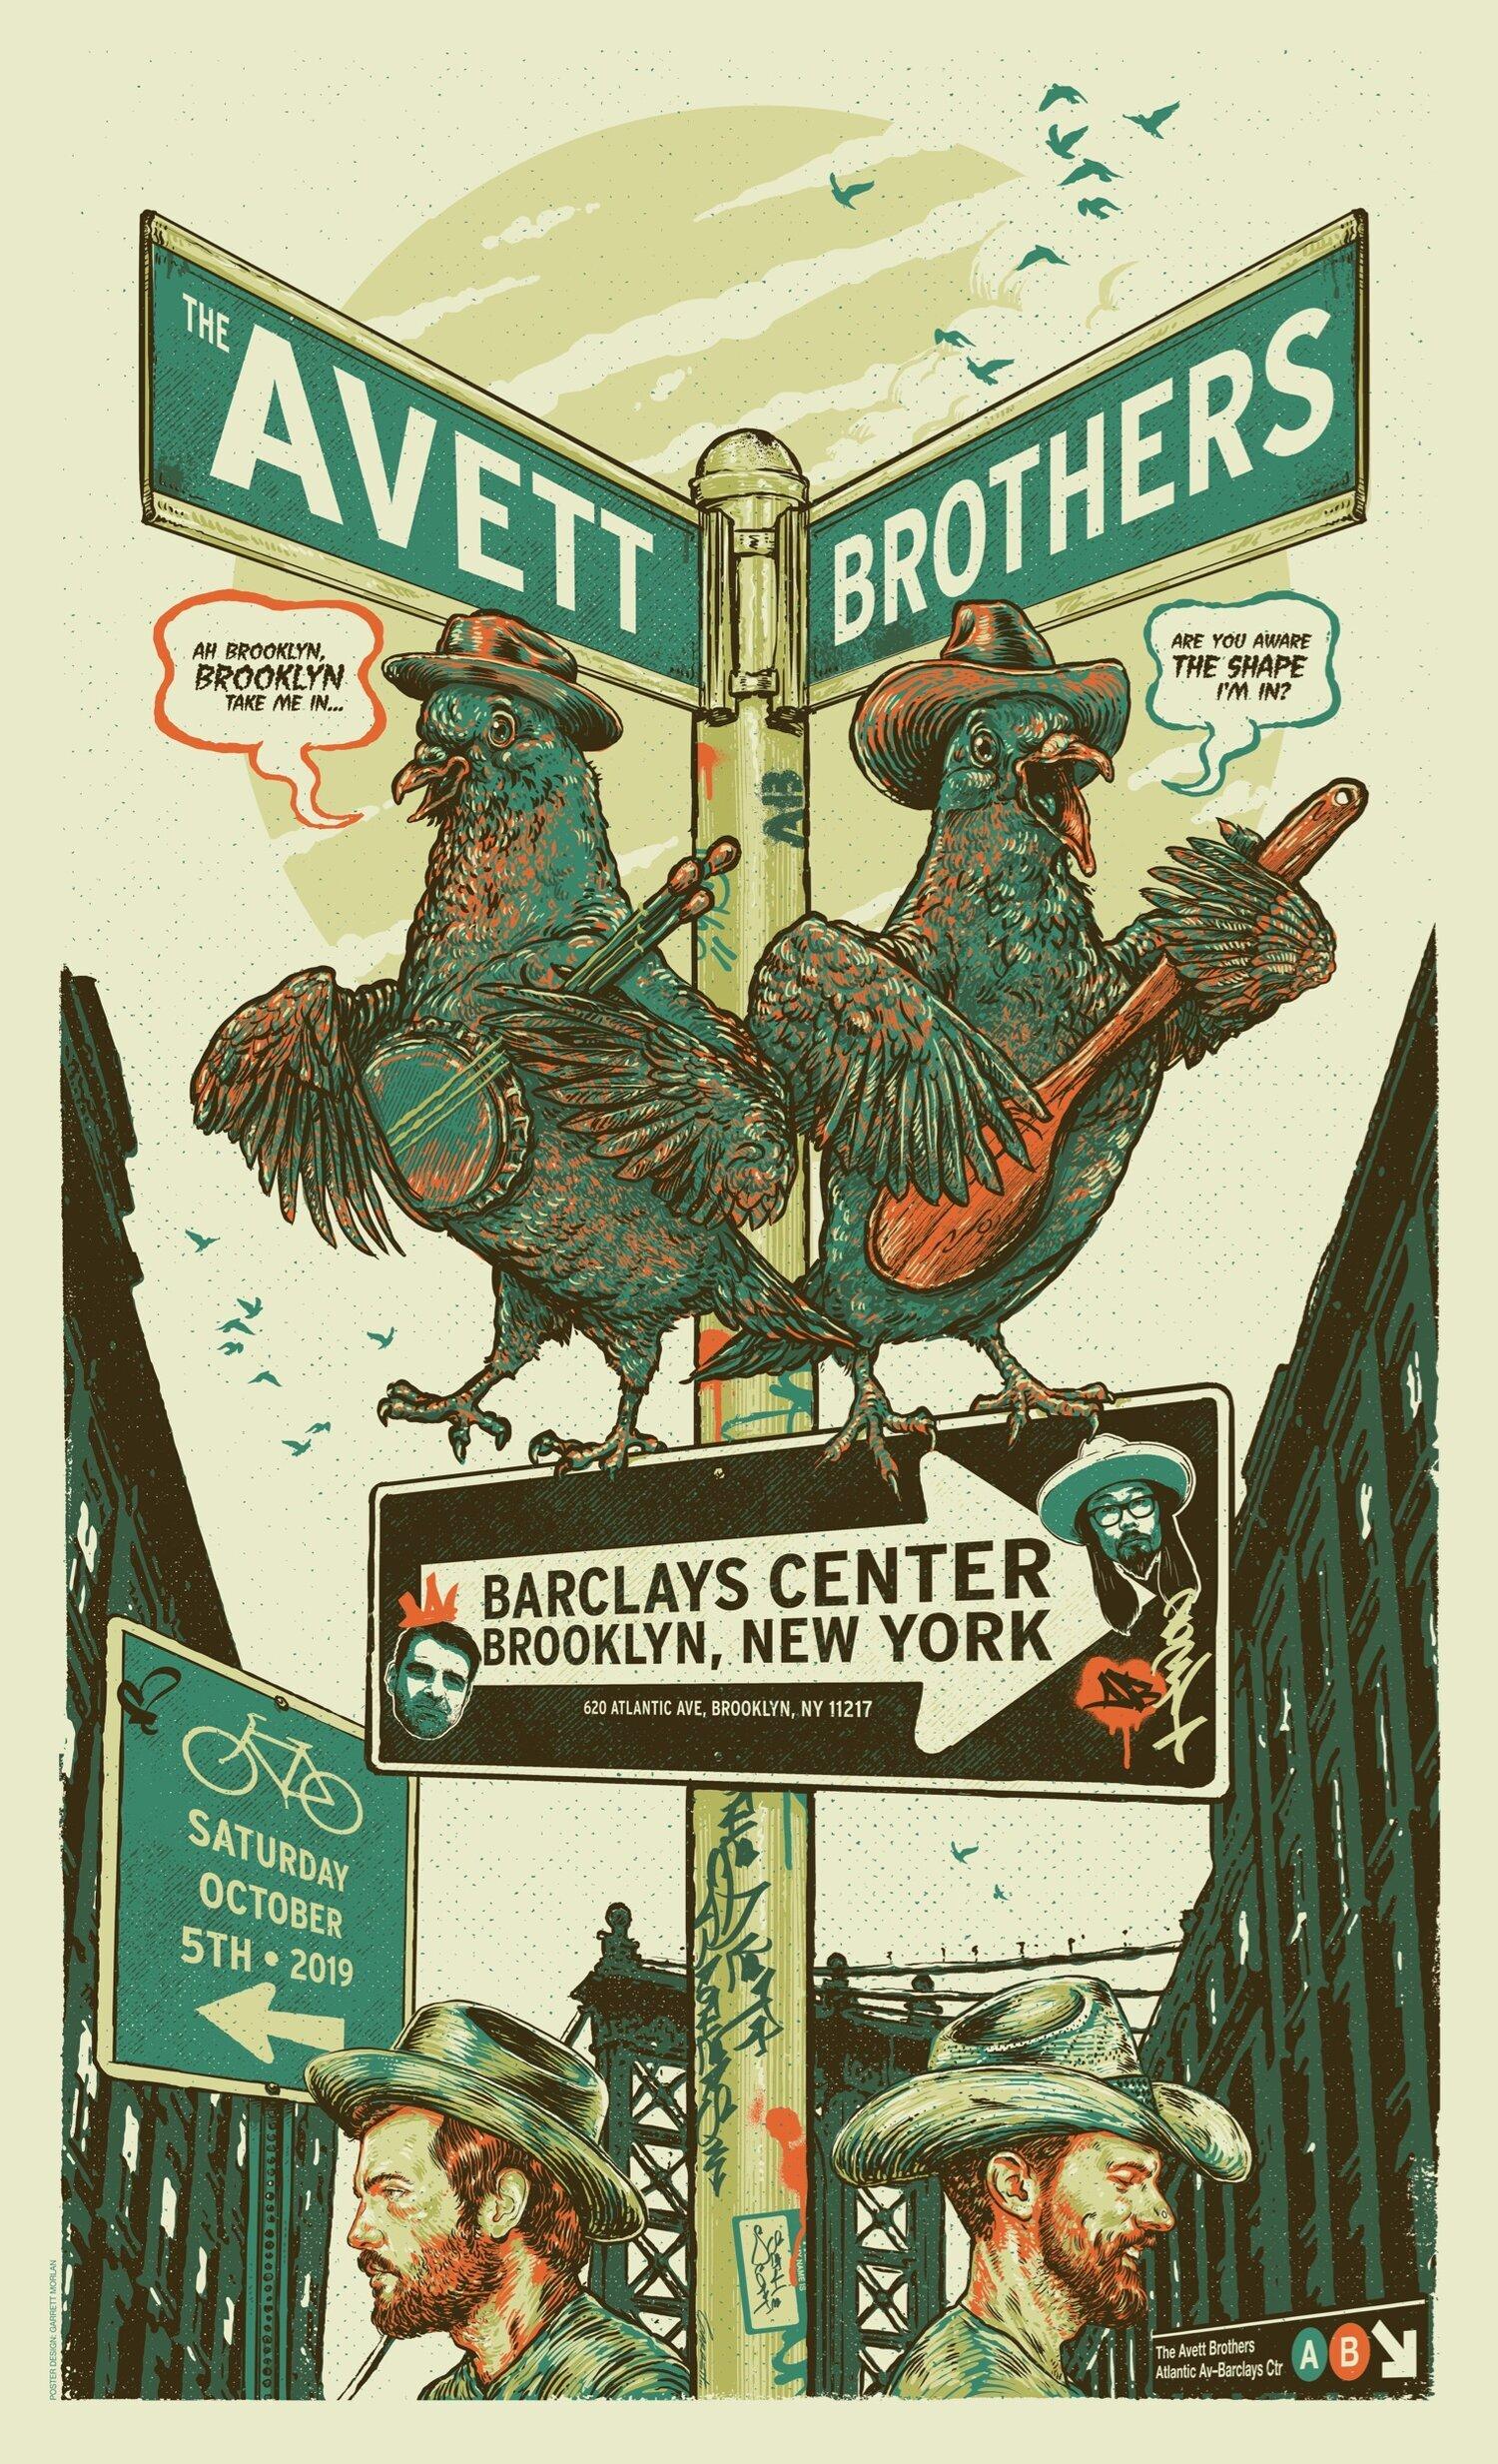 the avett brothers gig poster barclays ctr brooklyn ny 2019 garrett morlan